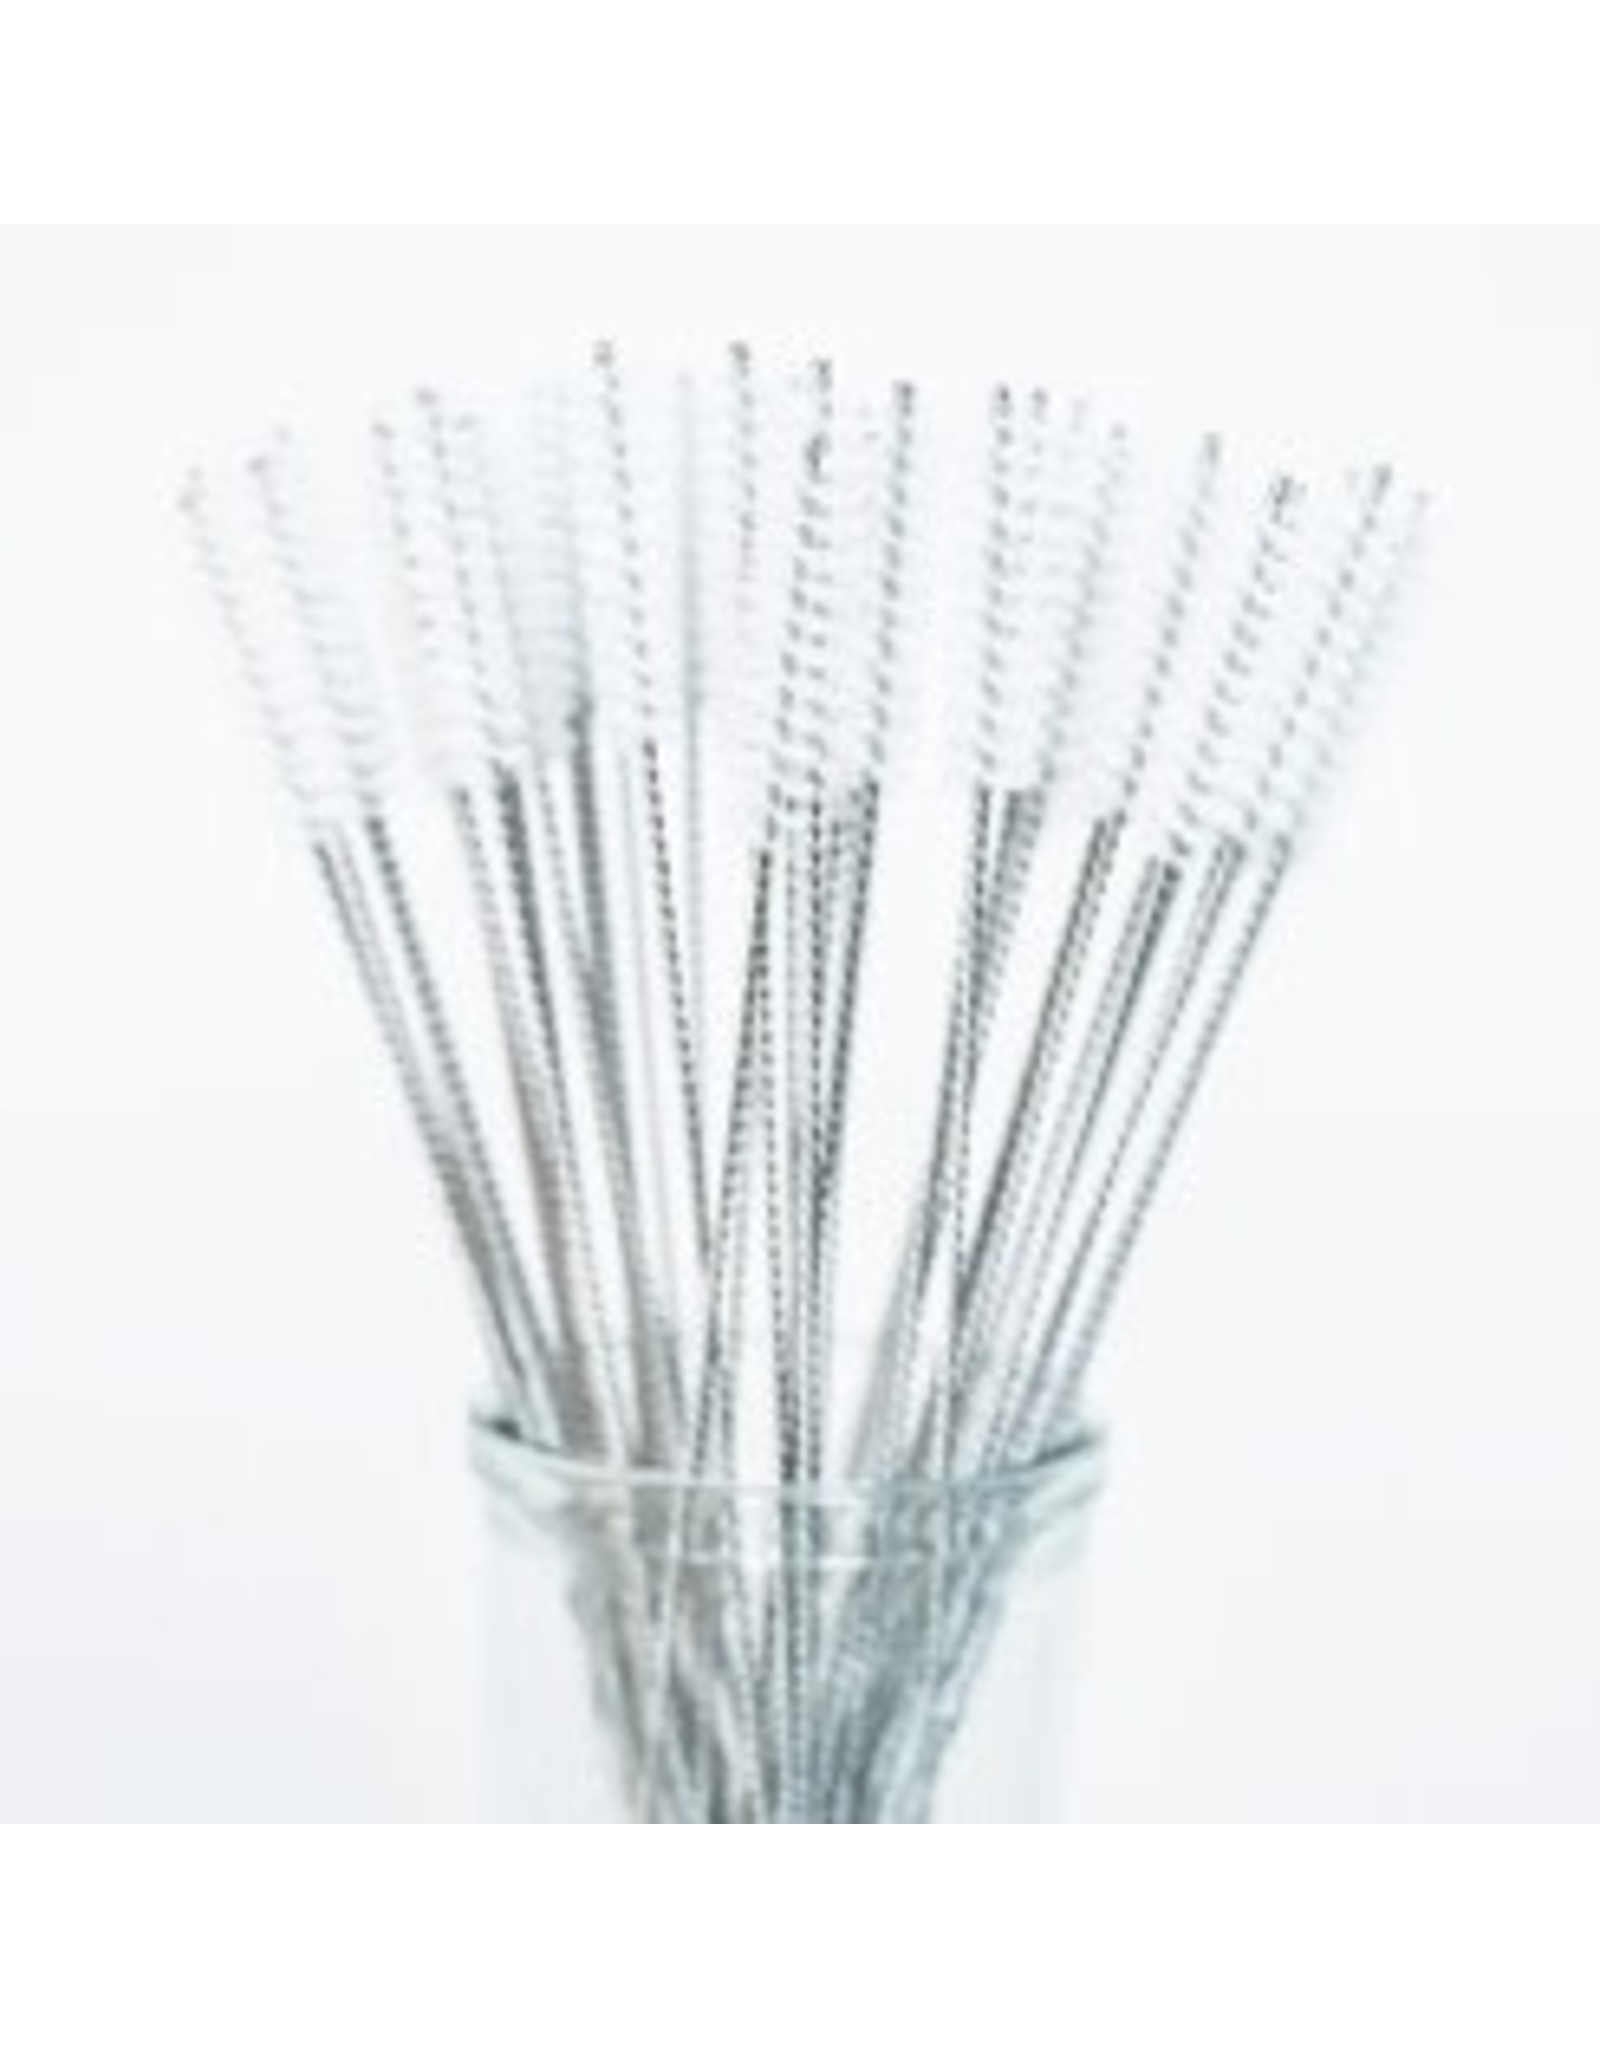 Colibri Straw Cleaning Brush - Large